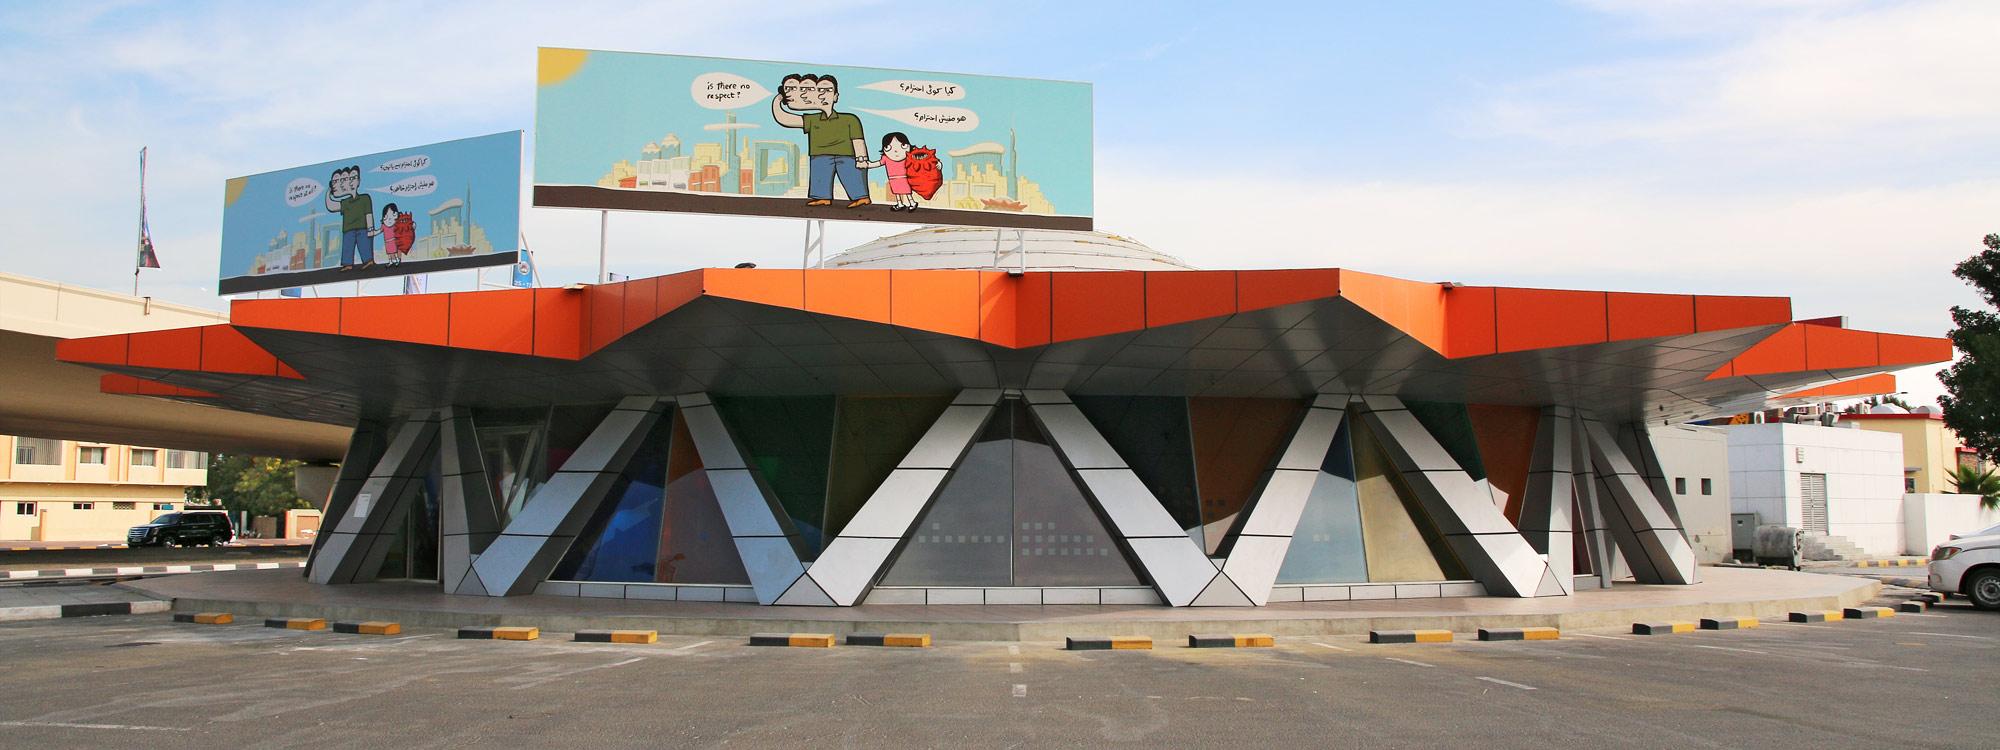 Sharjah Biennial 12. © Photo: Universes in Universe